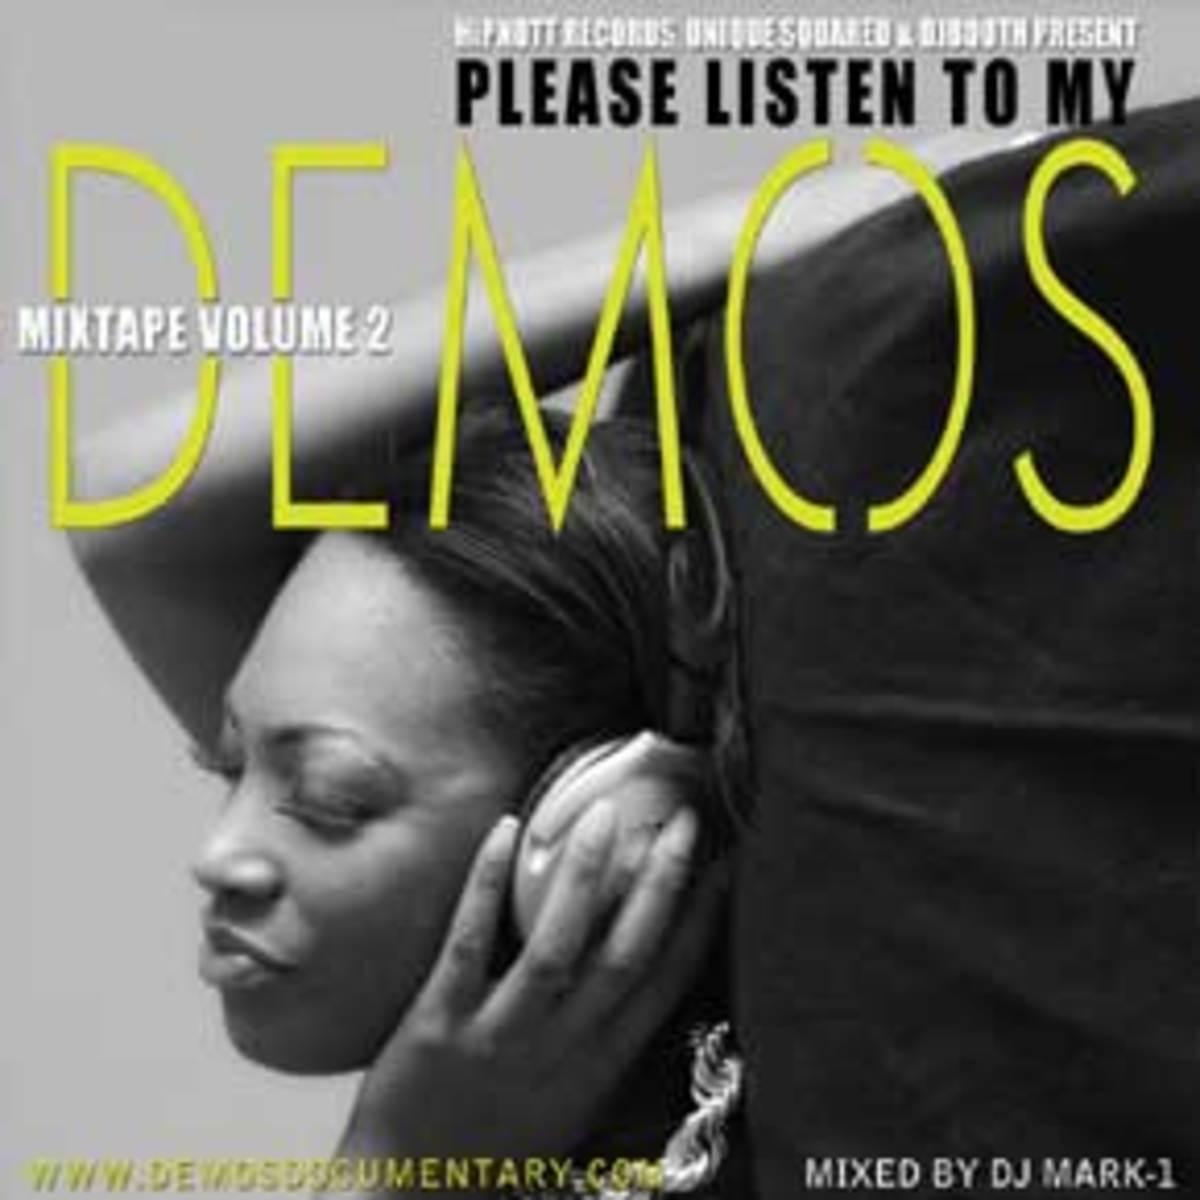 listen-demos-2.jpg